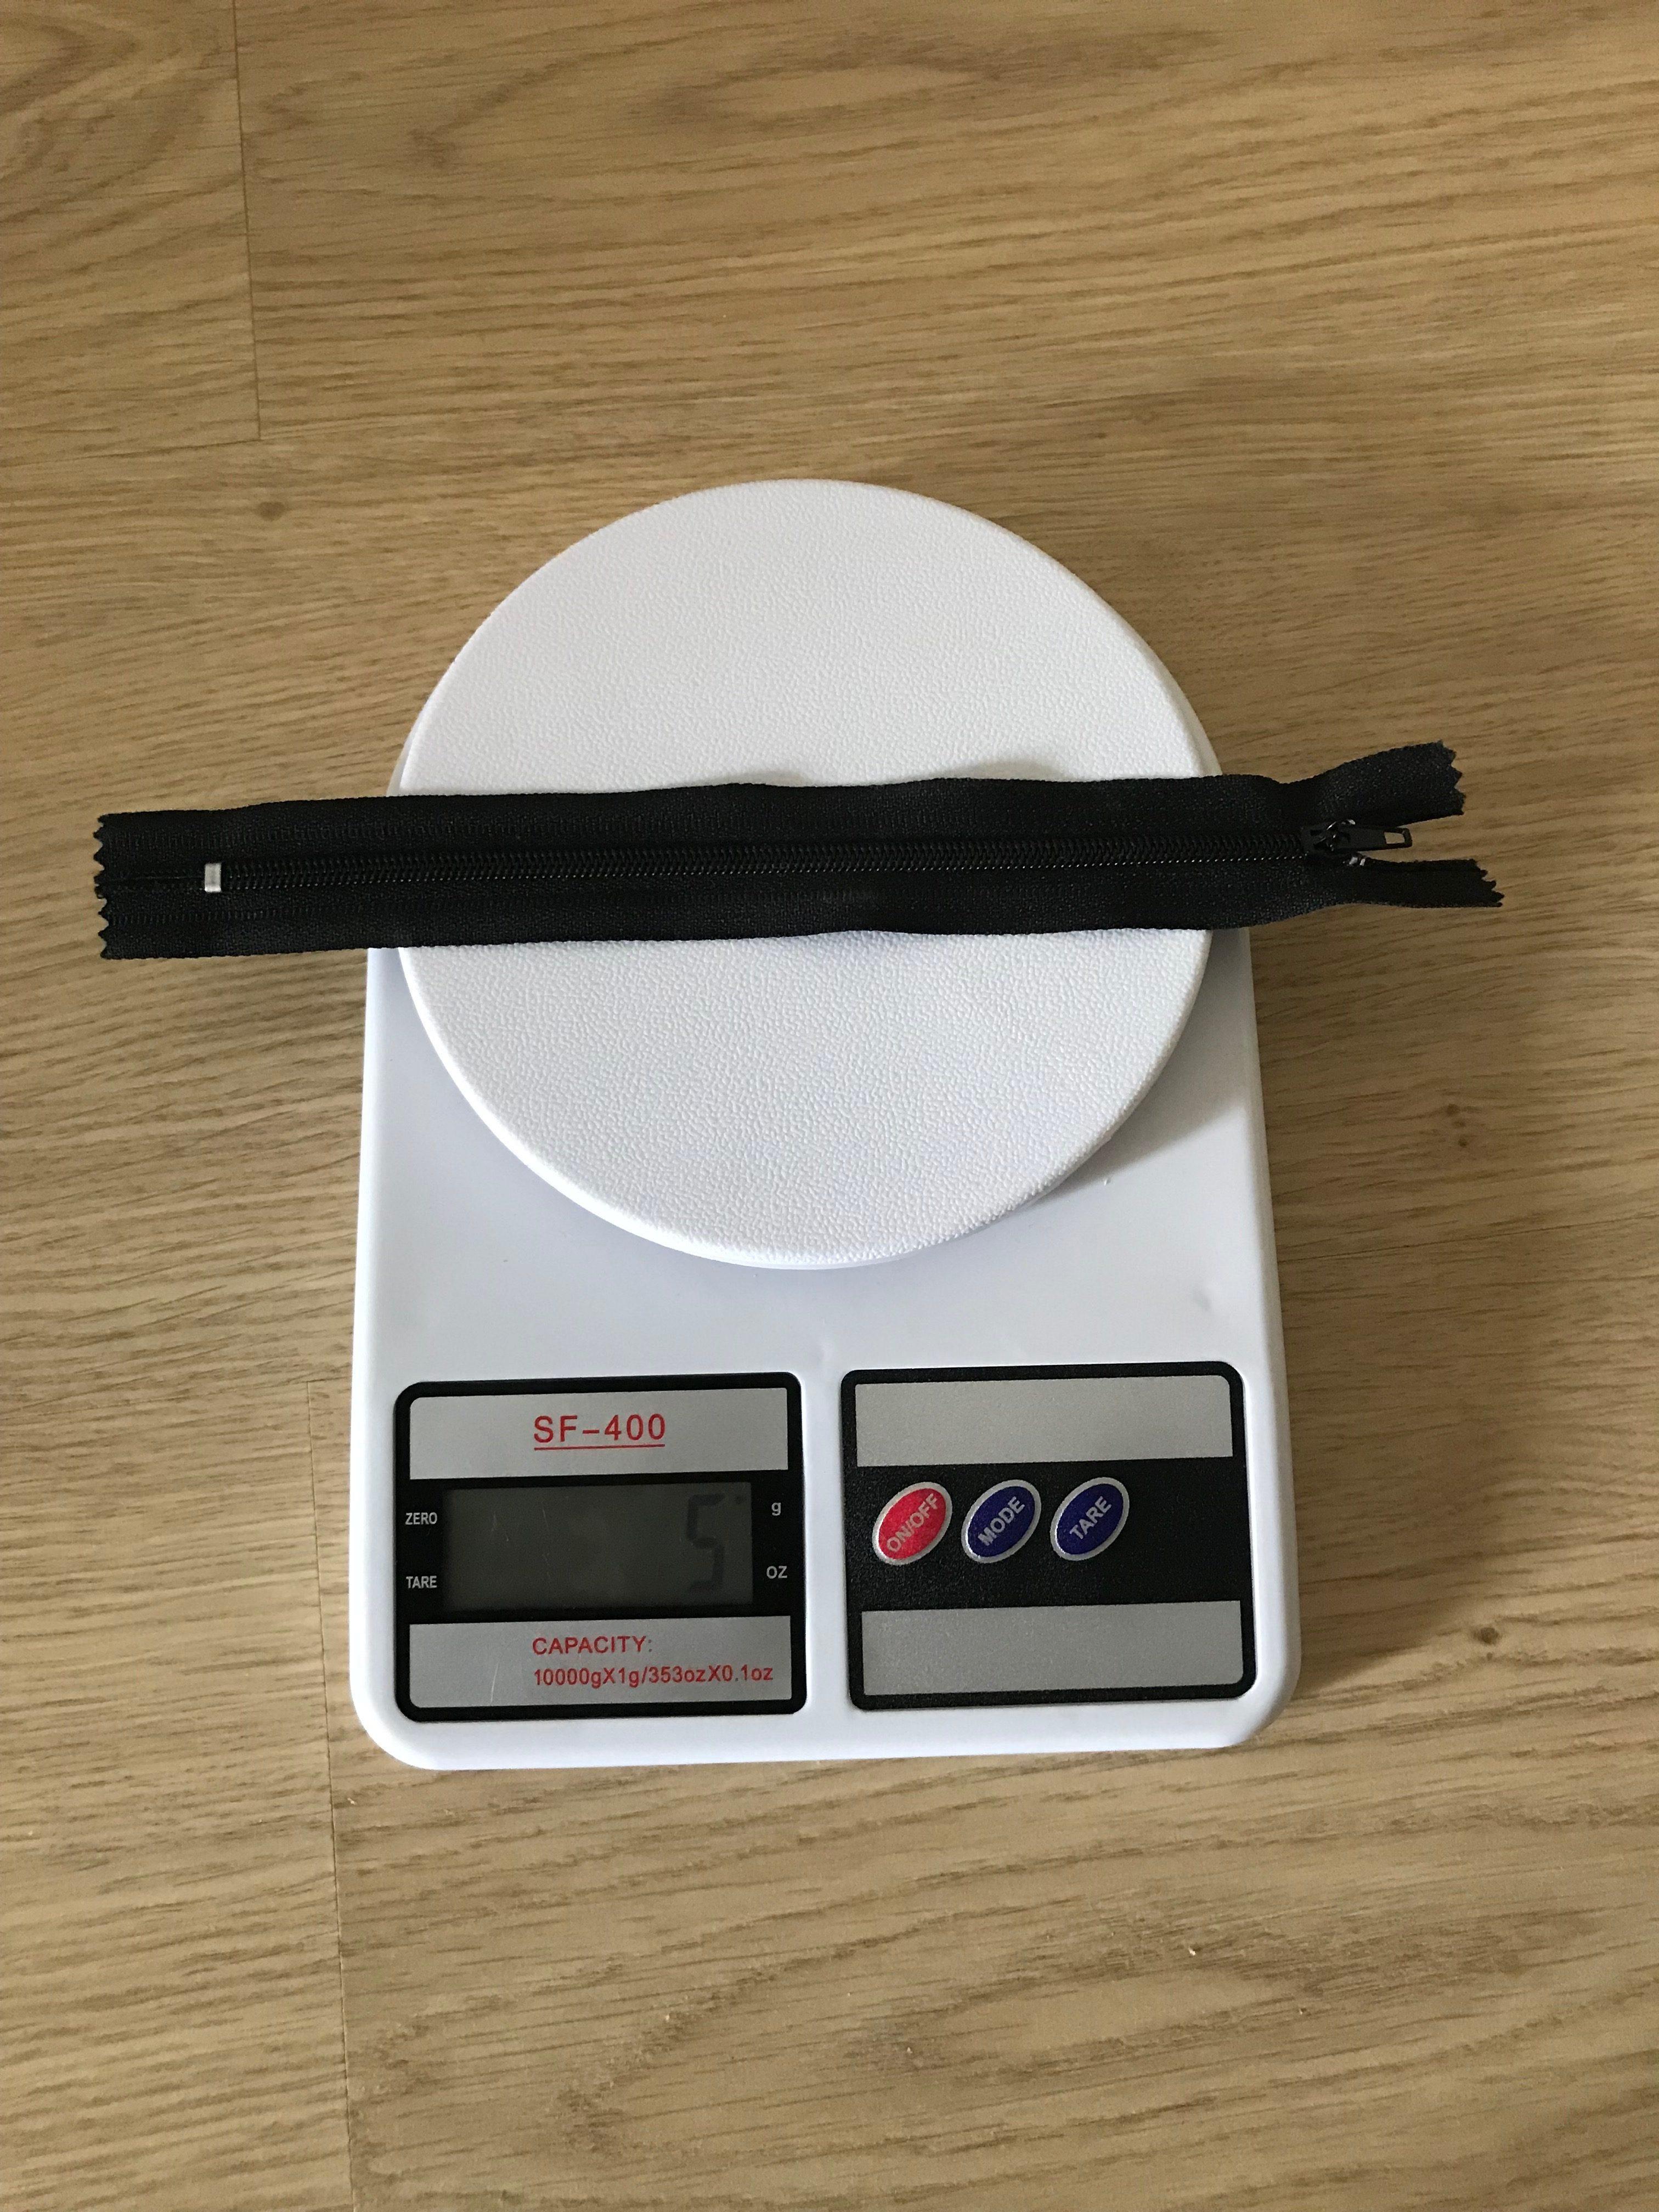 вес молнии